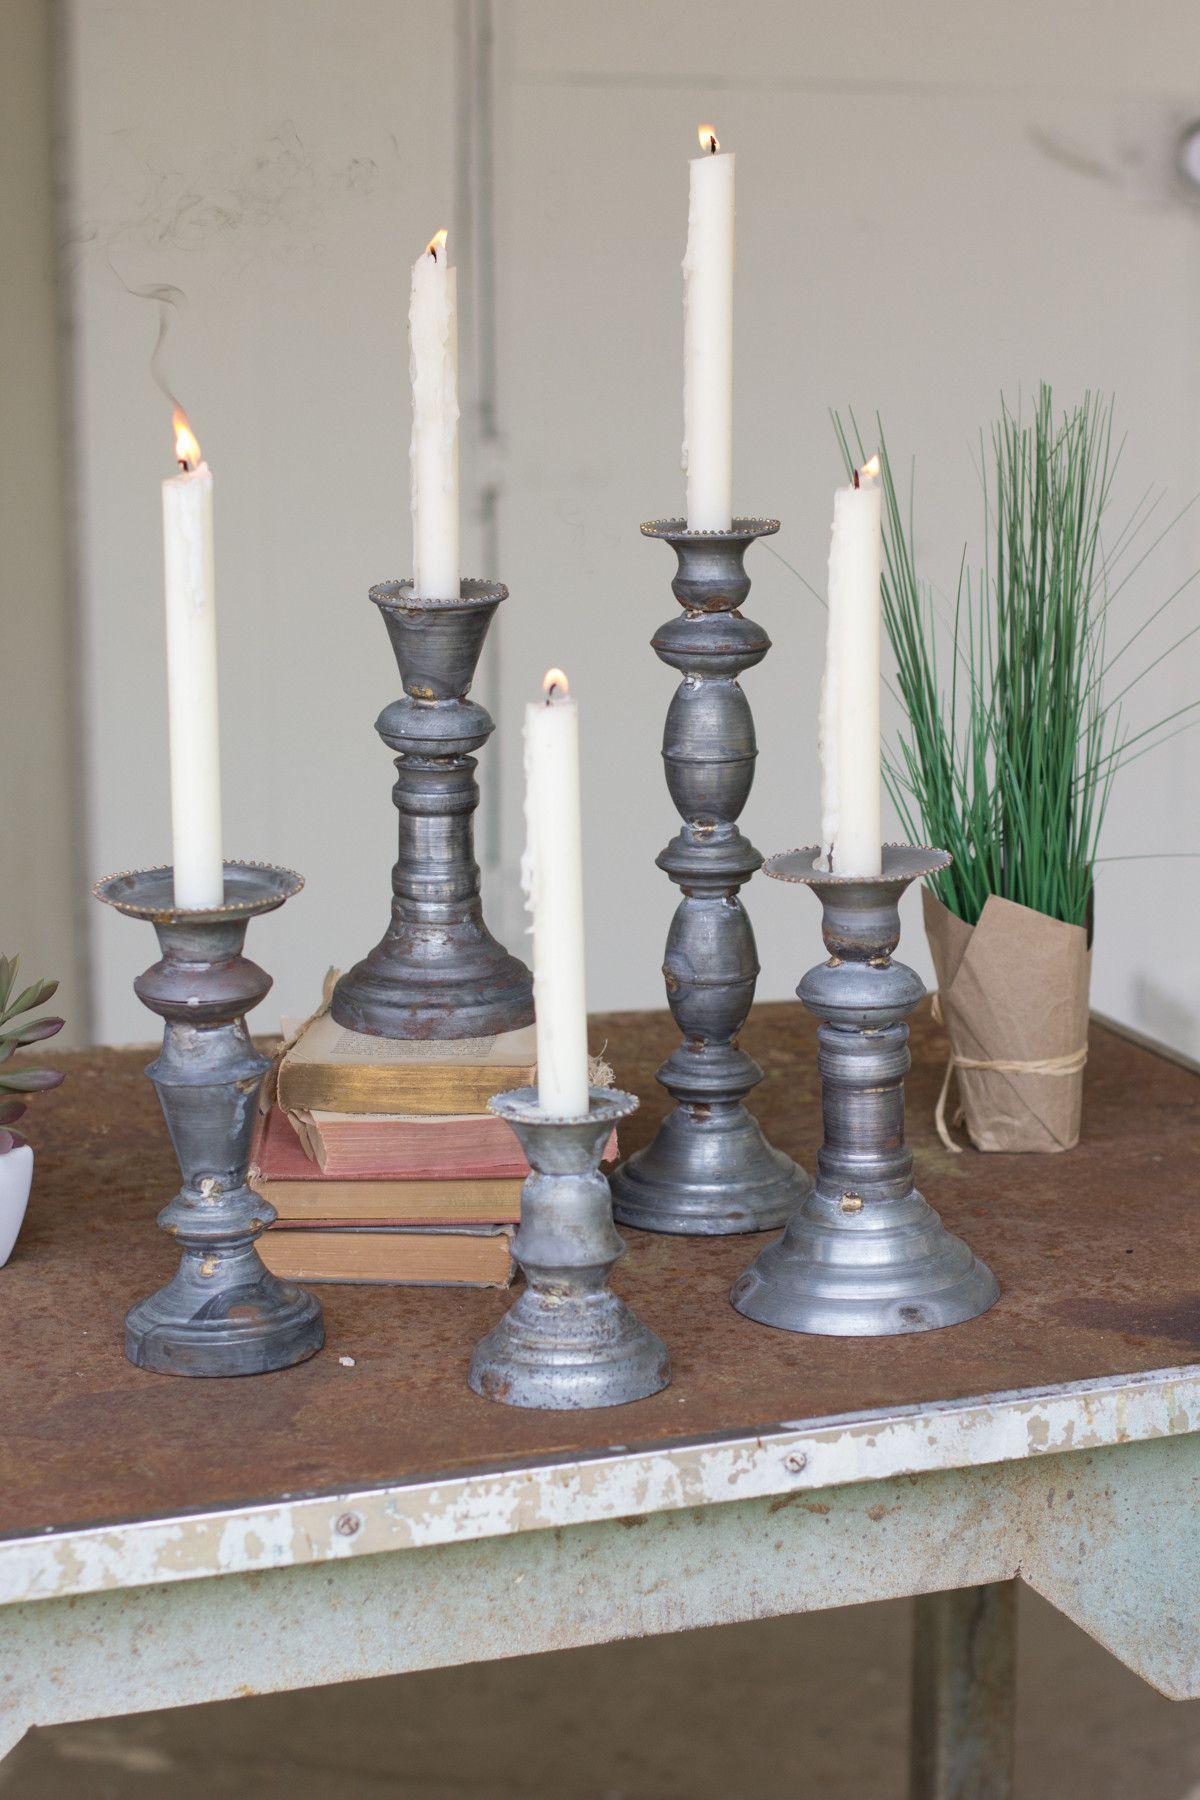 Zinc Farmhouse Candle Set Tall Candle Holders Farmhouse Candles Metal Candle Holders